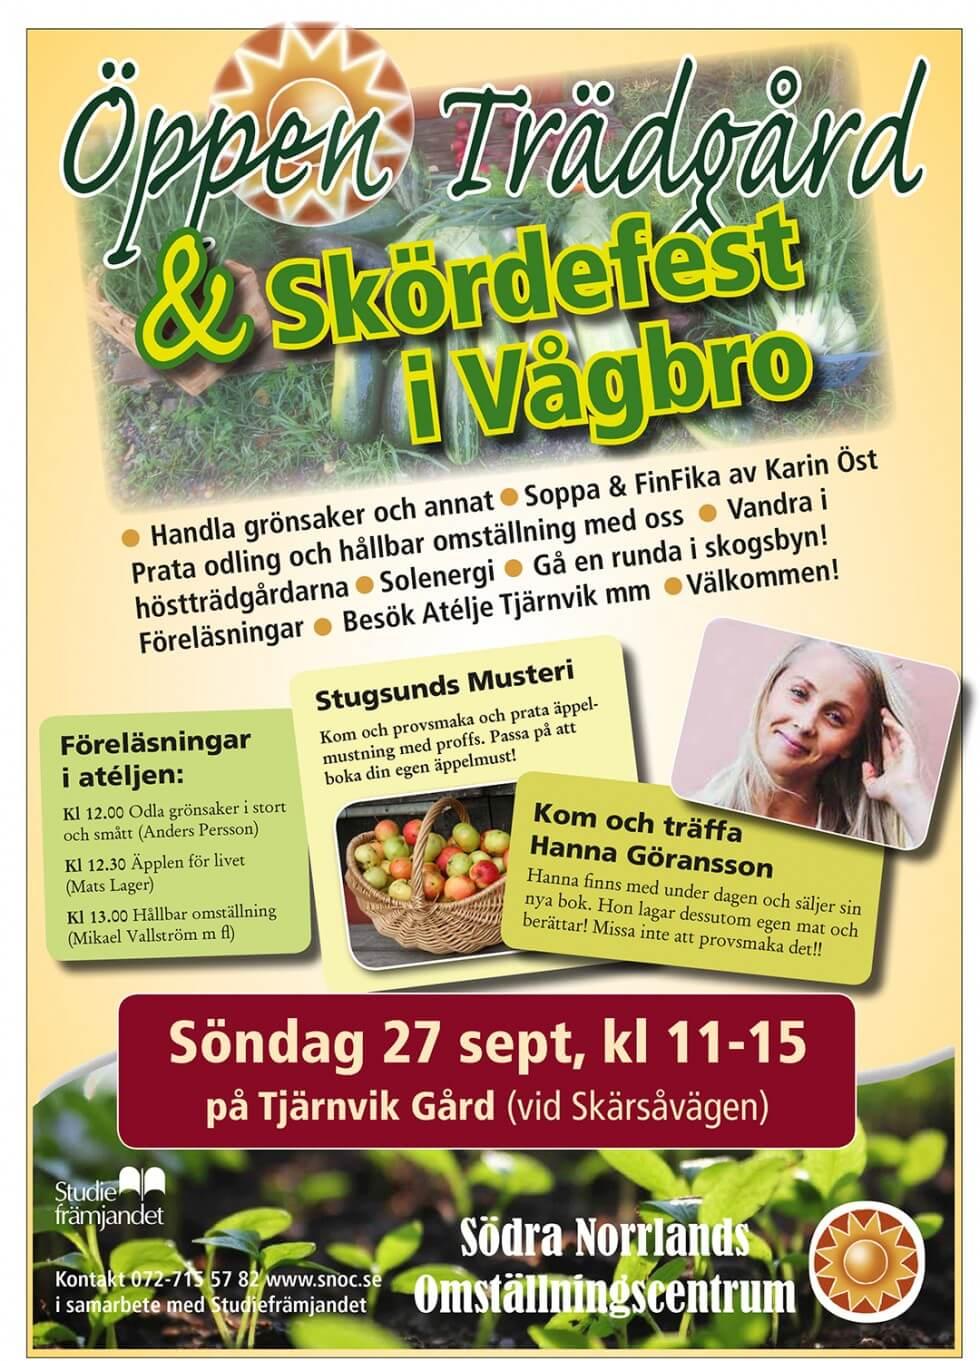 affisch-skc3b6rdefest-snoc-tjc3a4rnvik-gc3a5rd-27-sept-2015-web